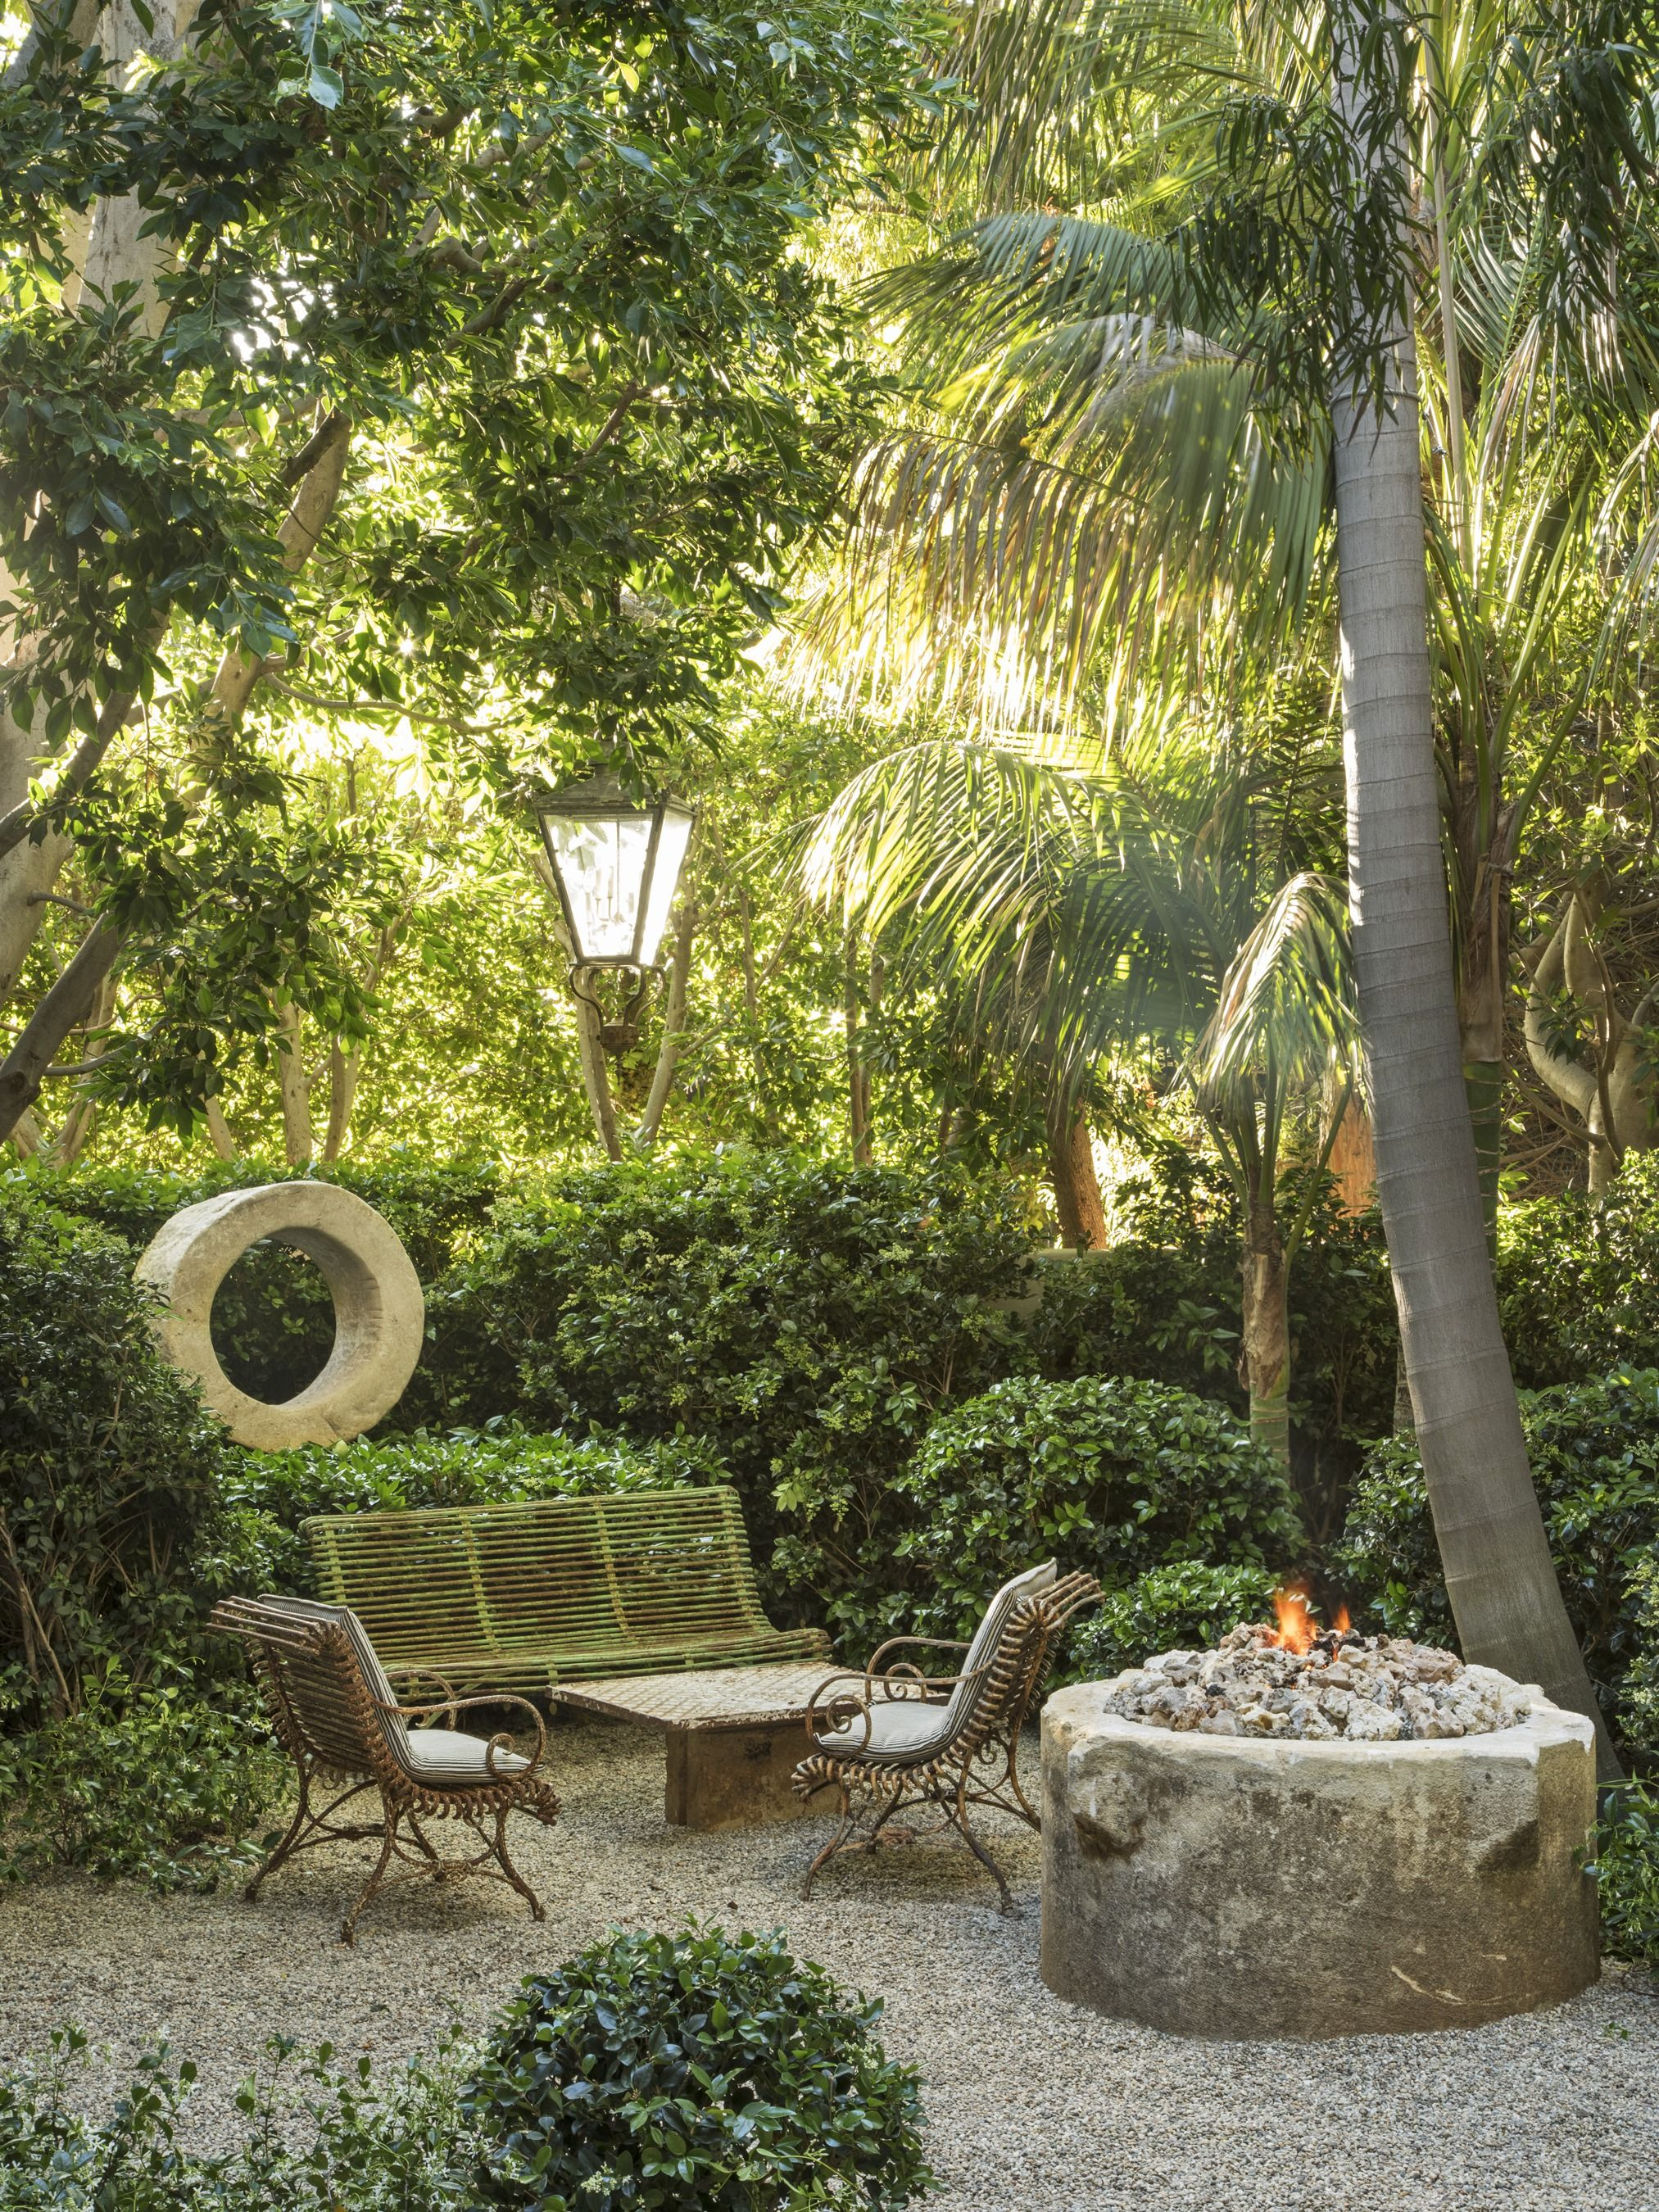 22 Outdoor Lighting Ideas The Best Outdoor Light Options